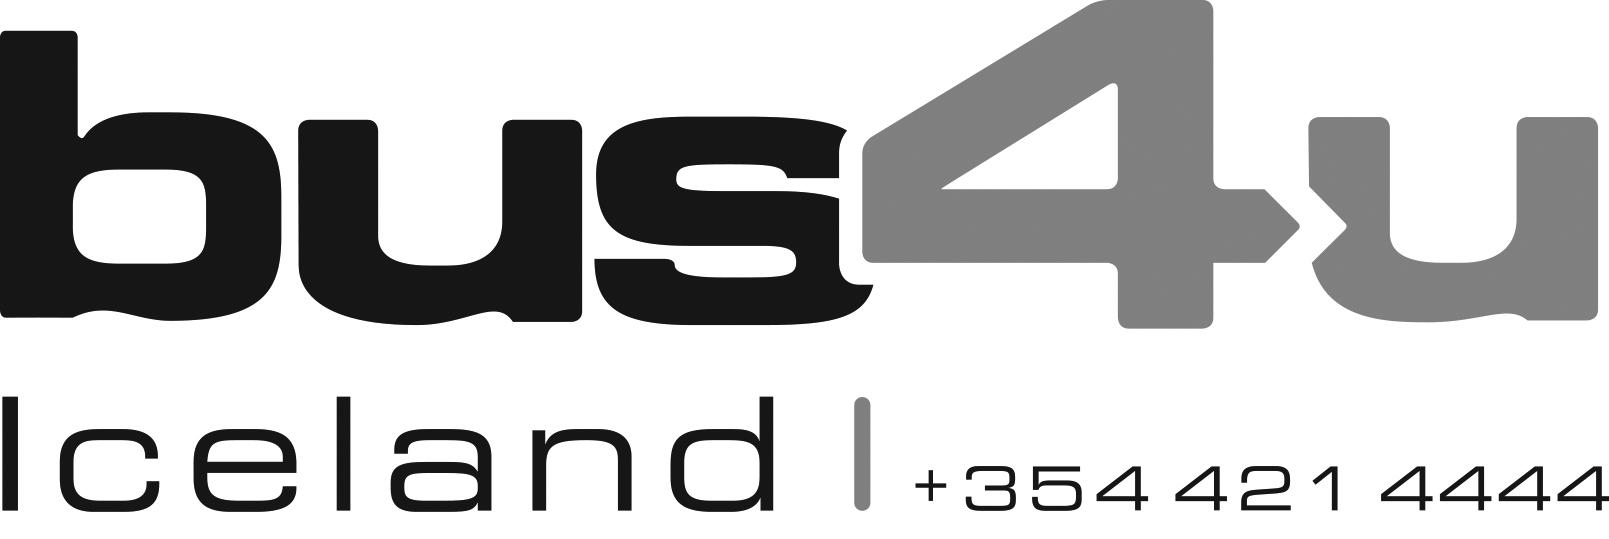 bus4u_logo_